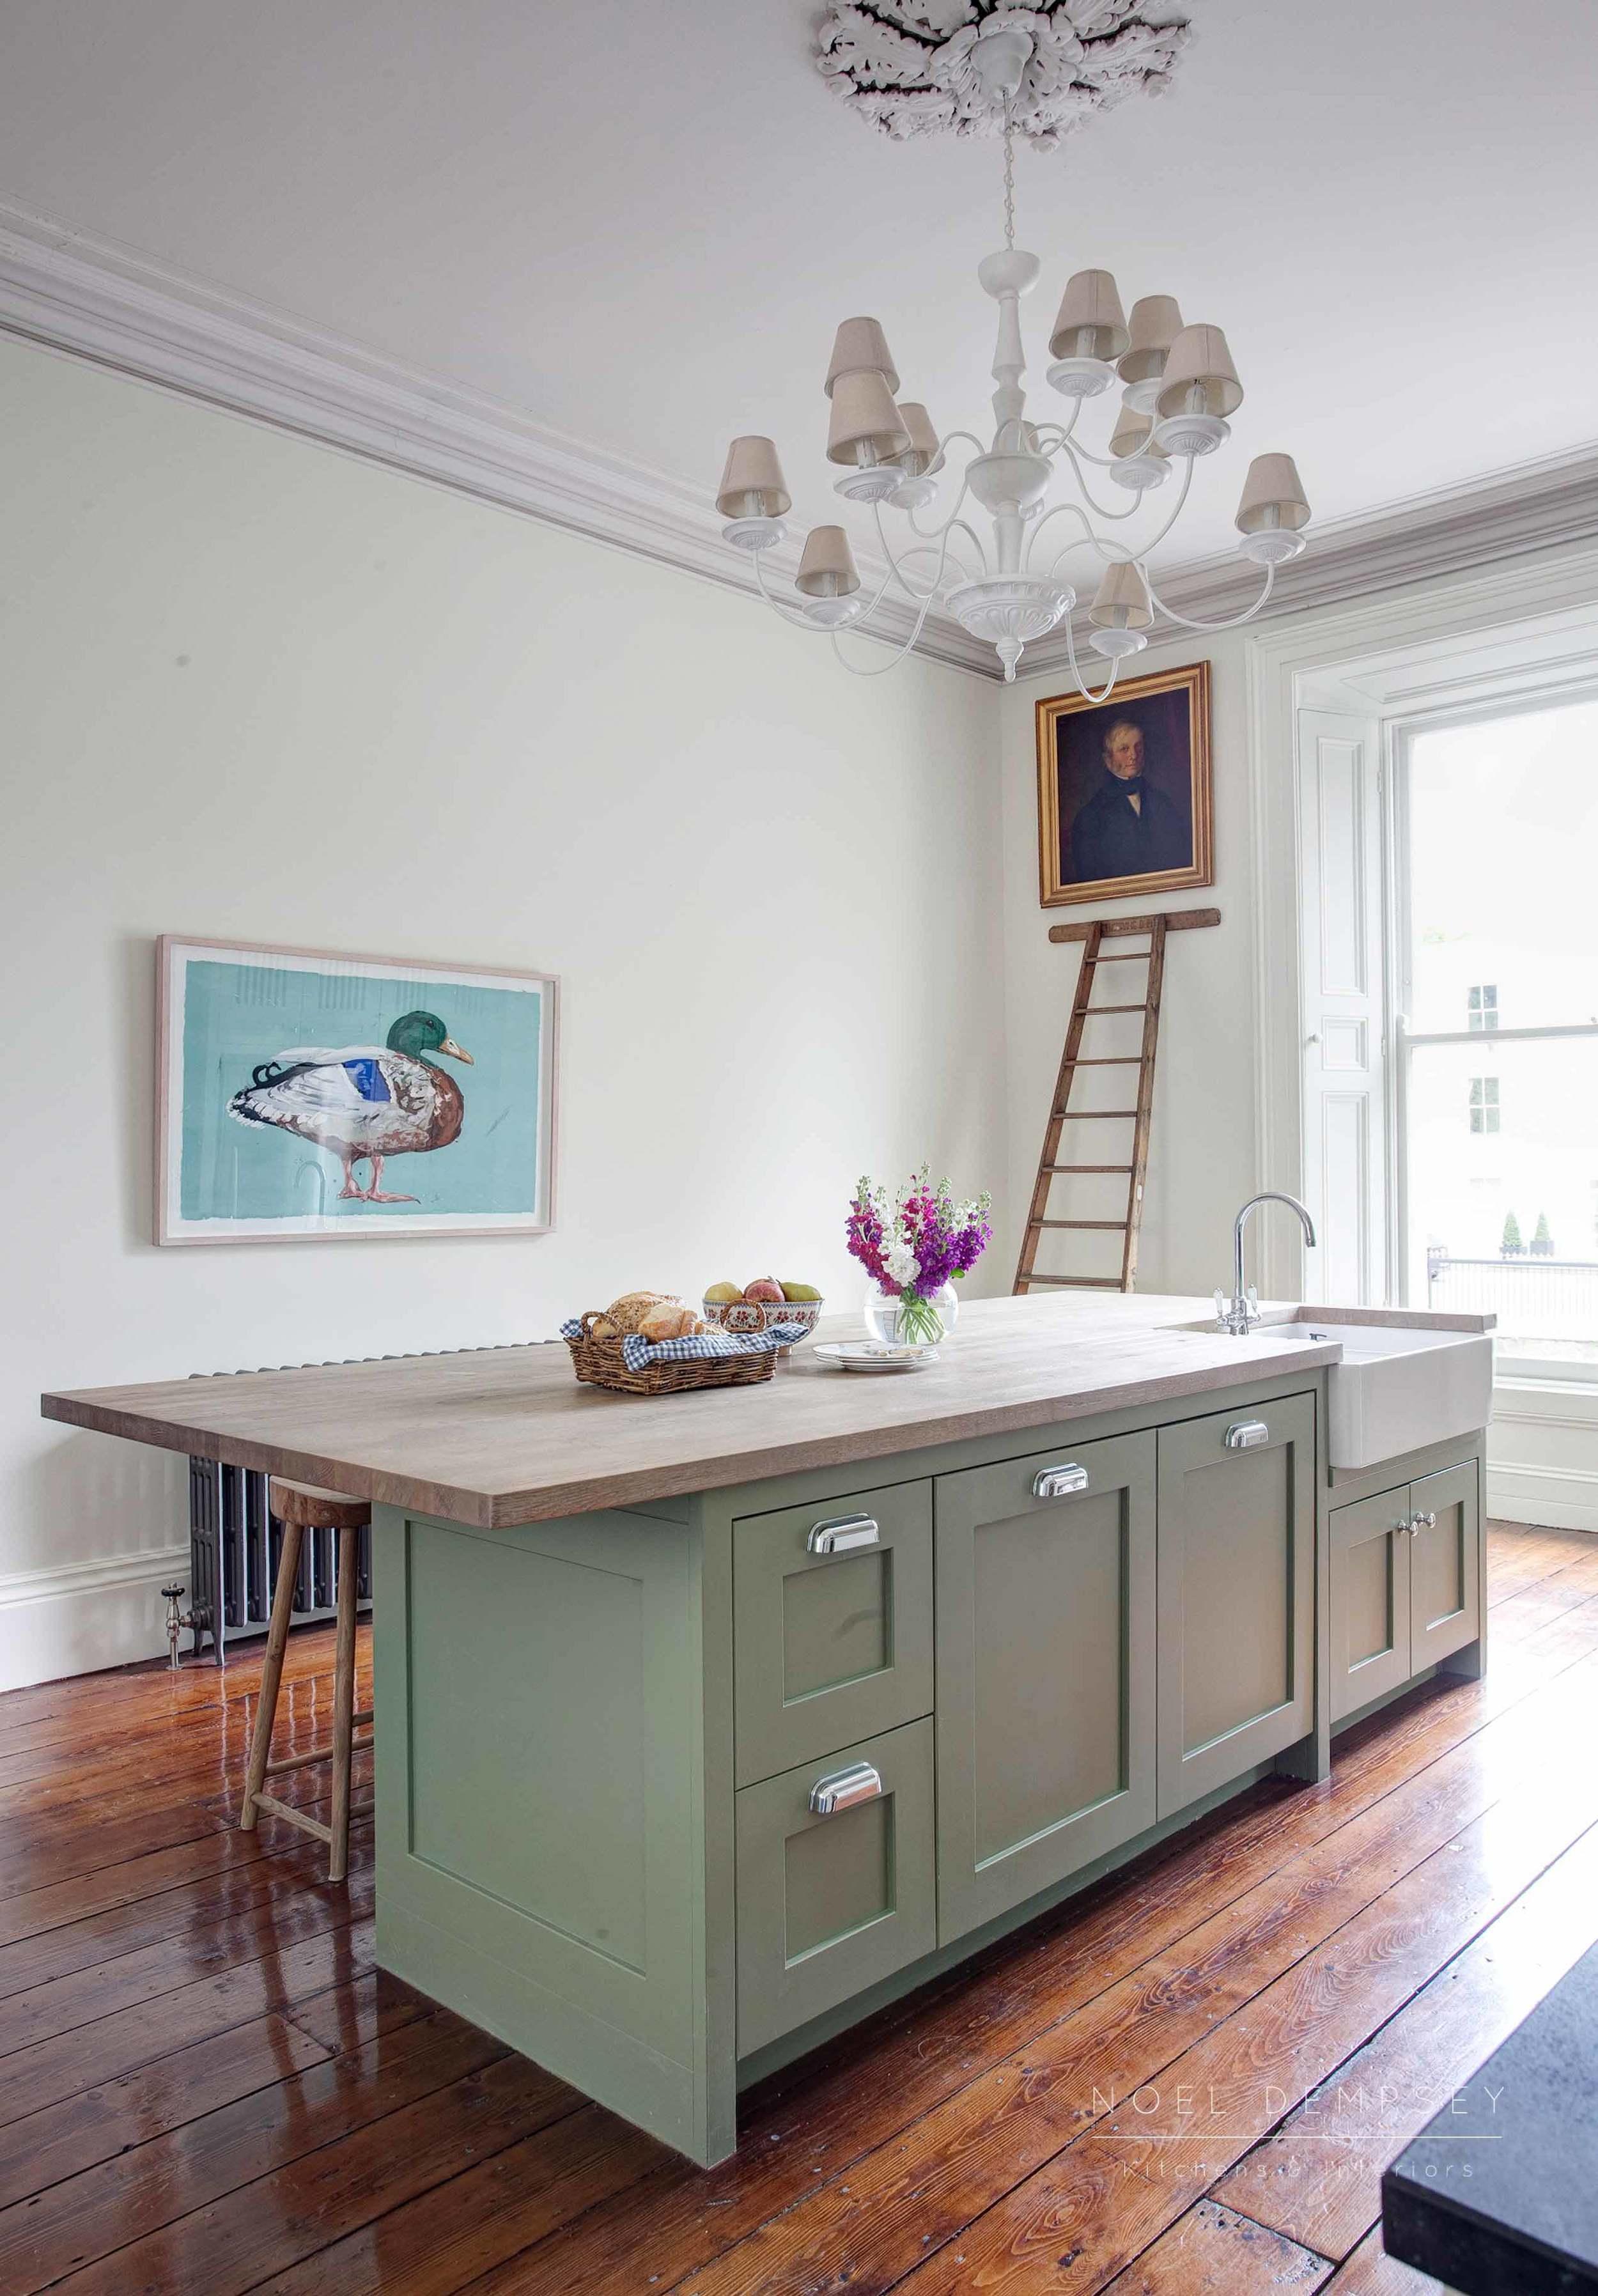 Belgrave-Plain-English-Kitchens-Ireland-4.jpg